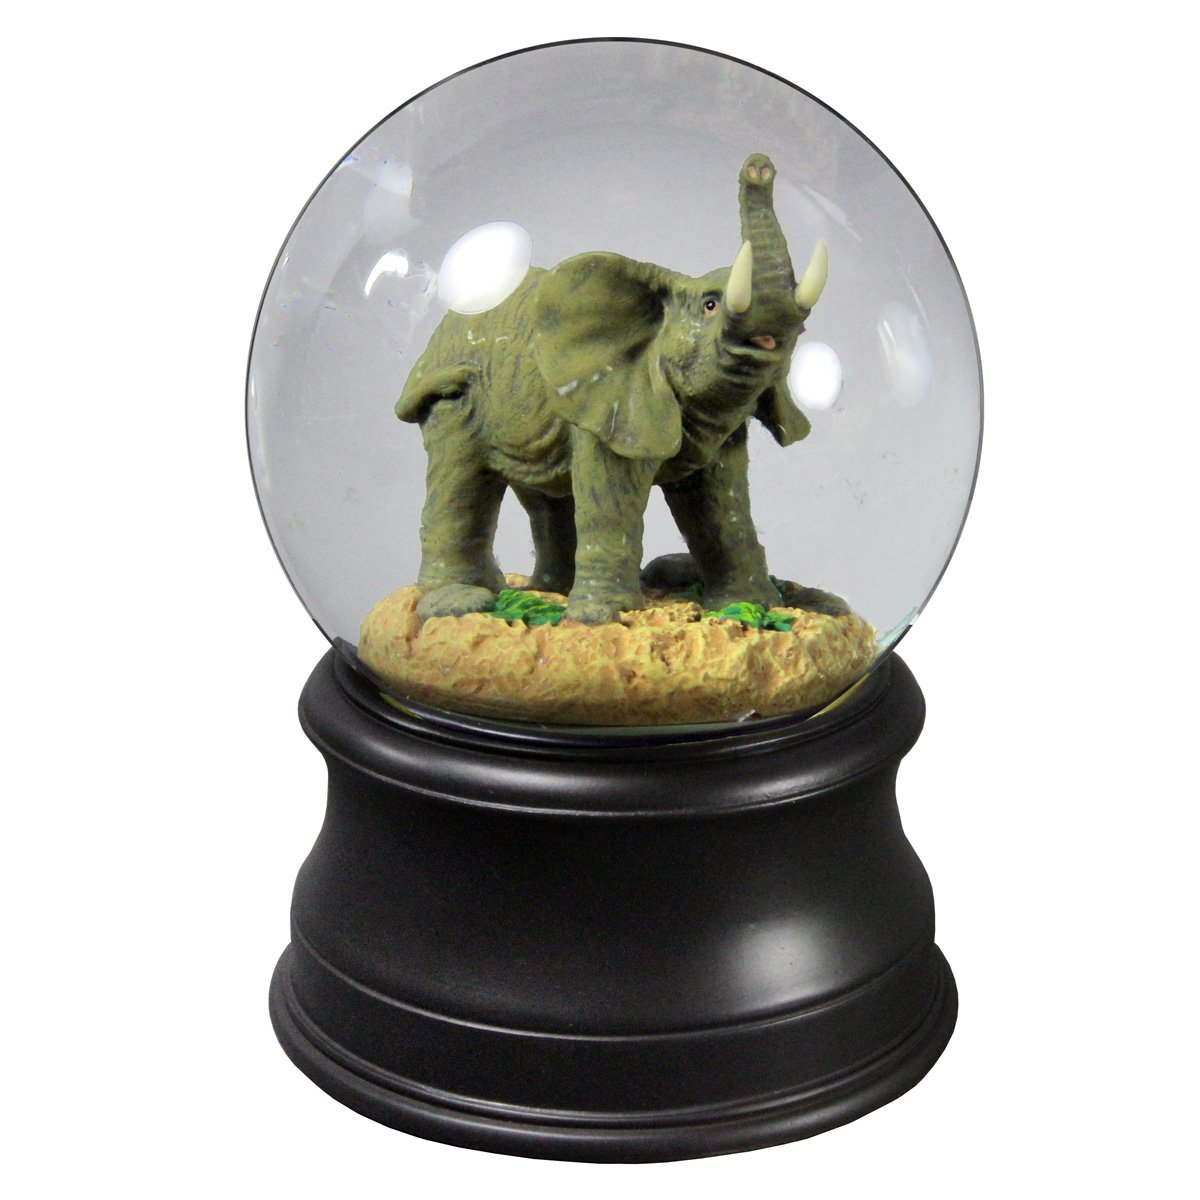 The Mighty Elephant Water Globe from The San Francisco Music Box Company